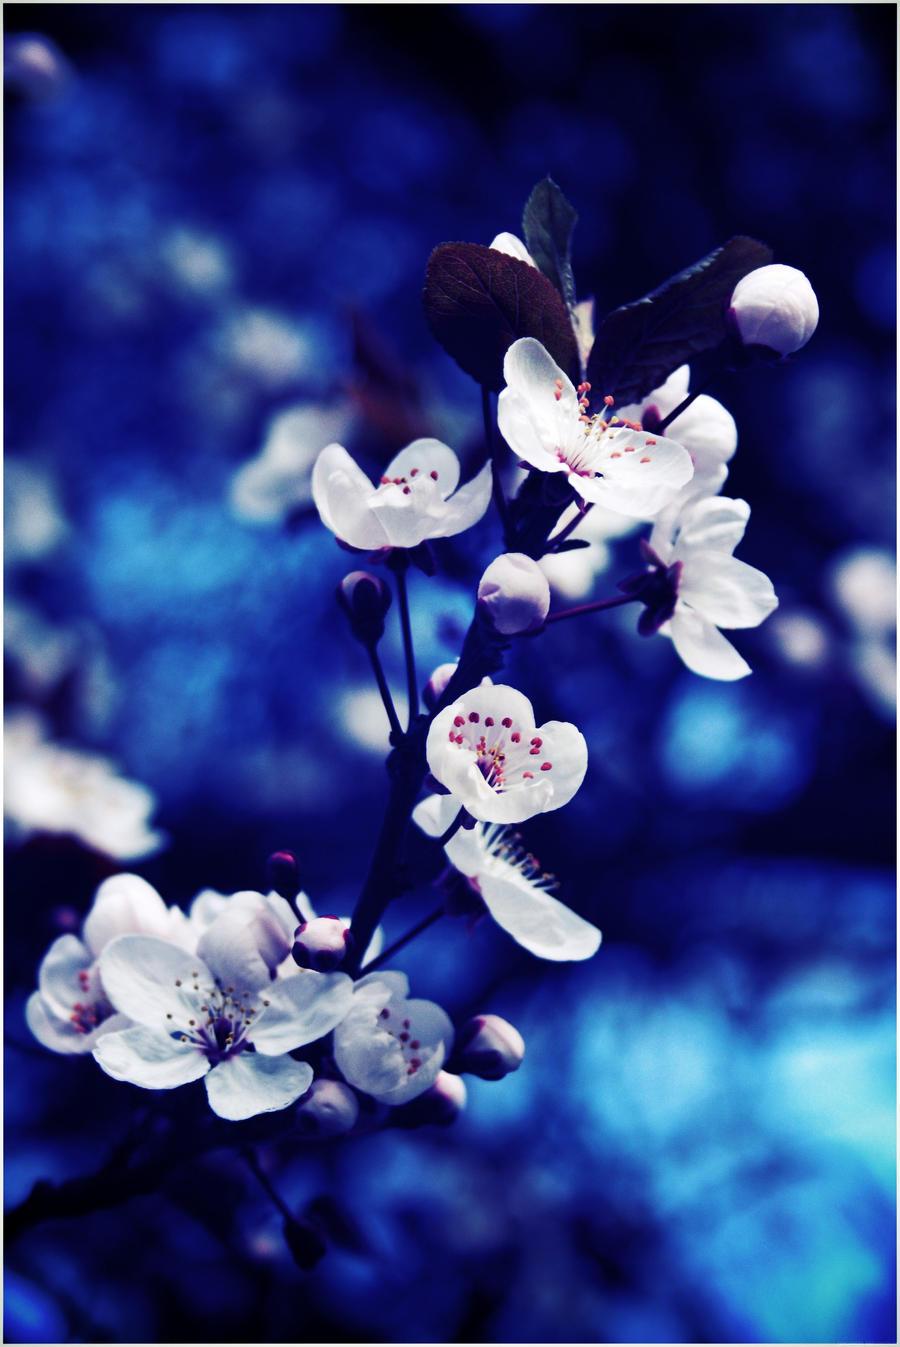 Blue Flower by CreamyJem